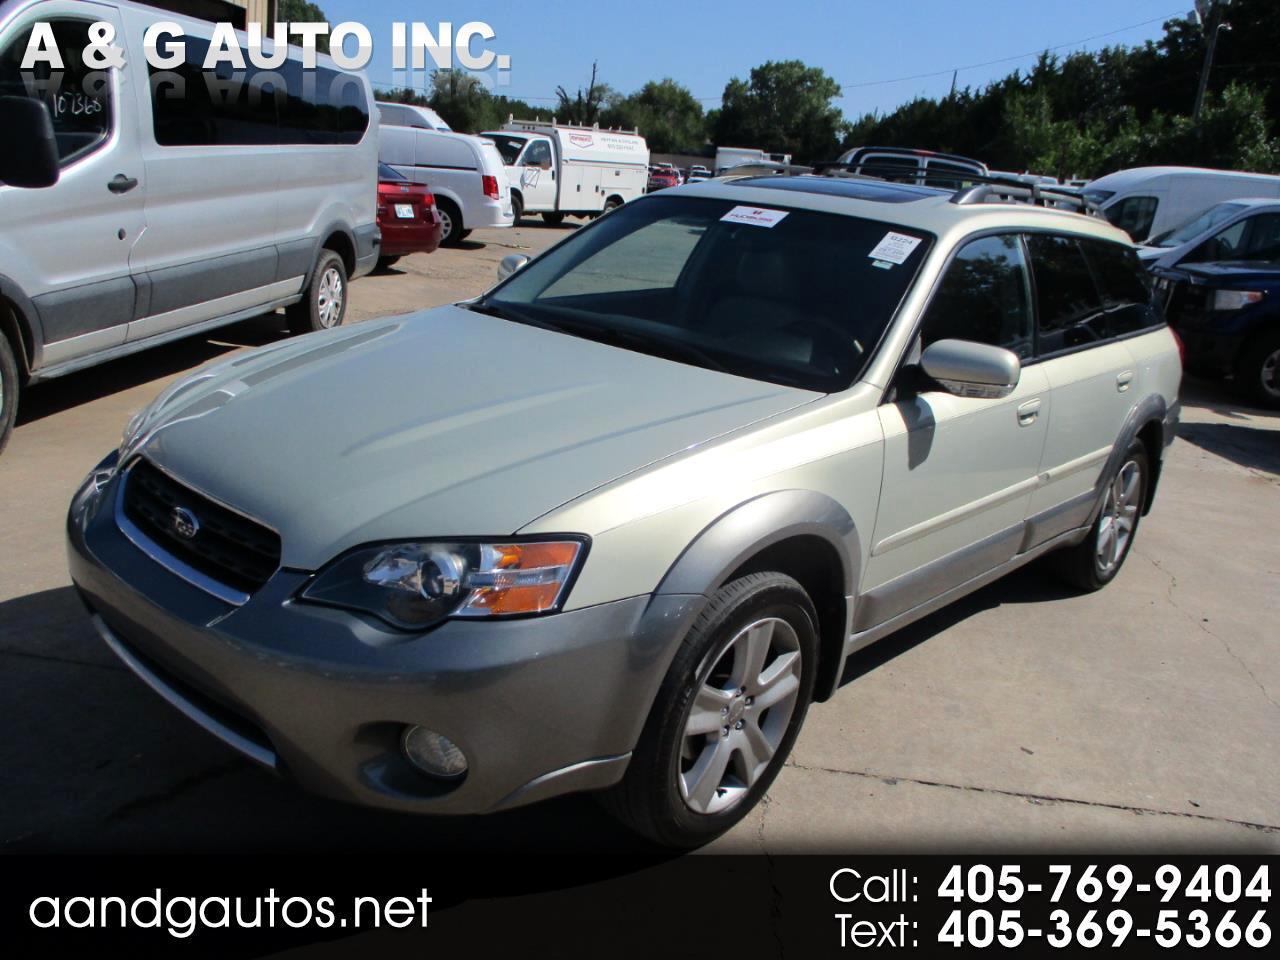 Subaru Outback 3.0R L.L.Bean Edition Wagon 2005